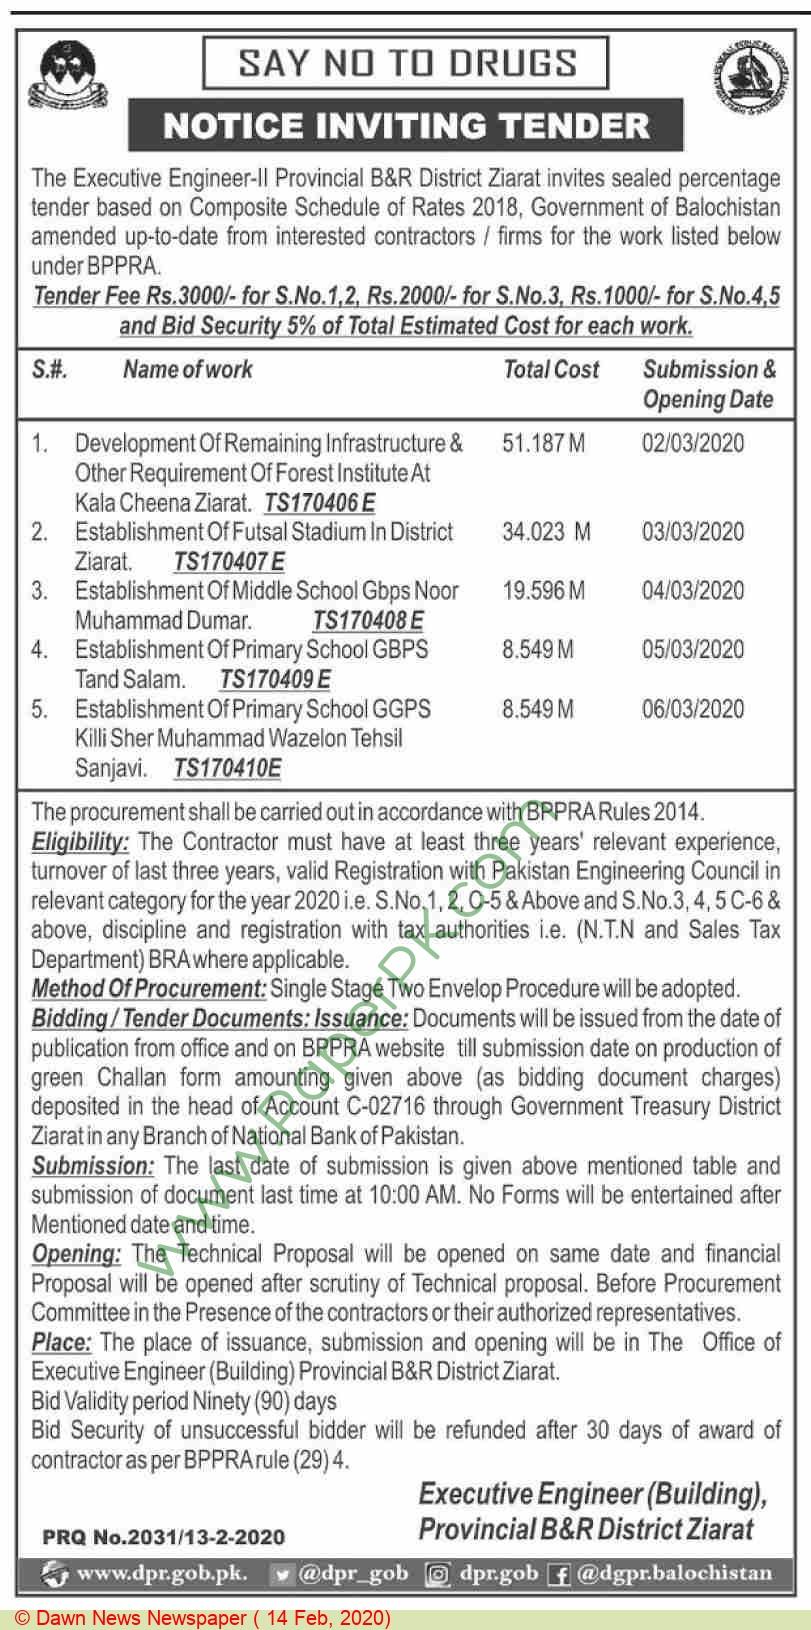 Provincial B & R District Ziarat Tender Notice